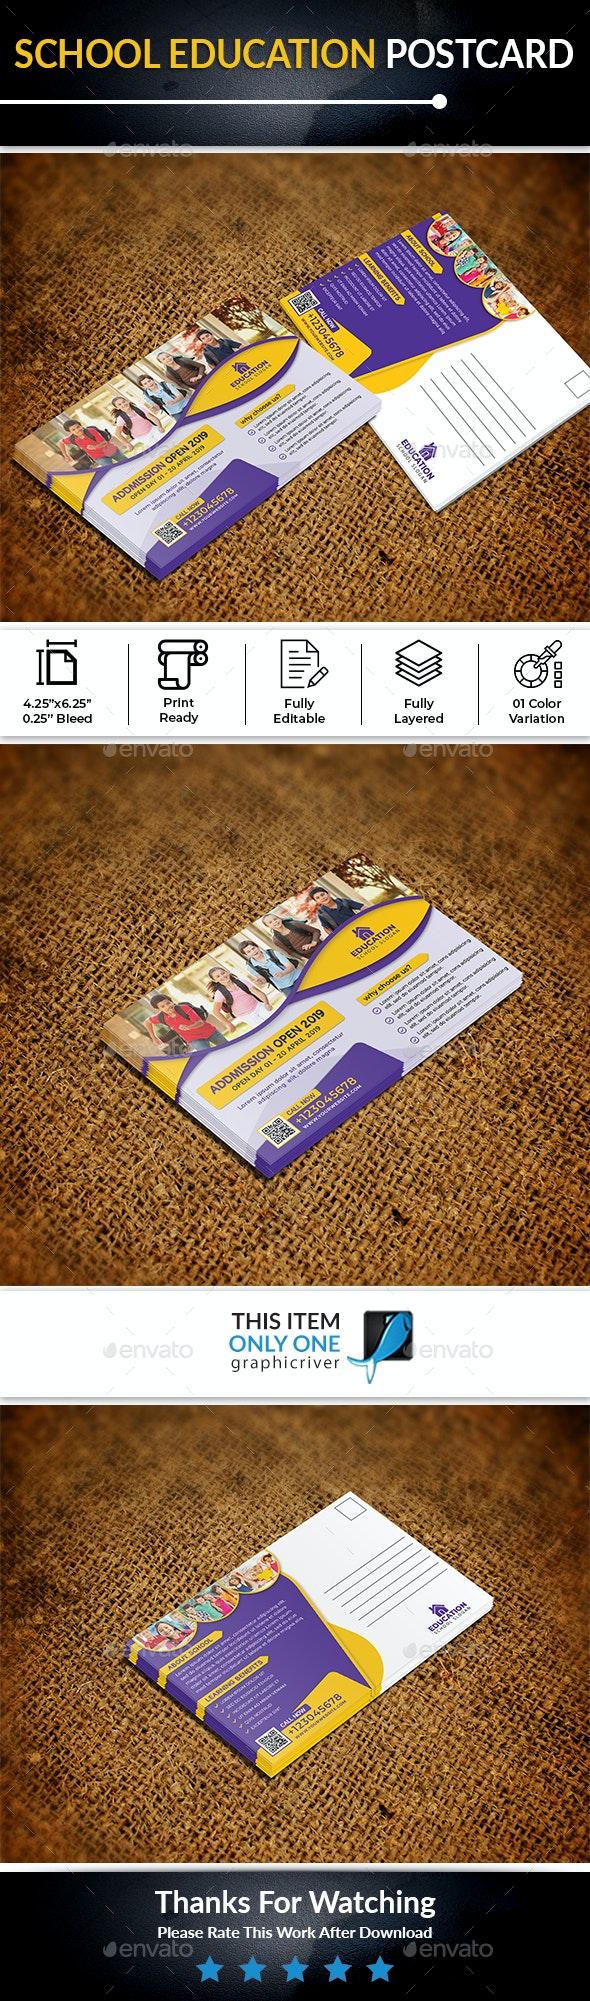 School Education Post Card - Cards & Invites Print Templates